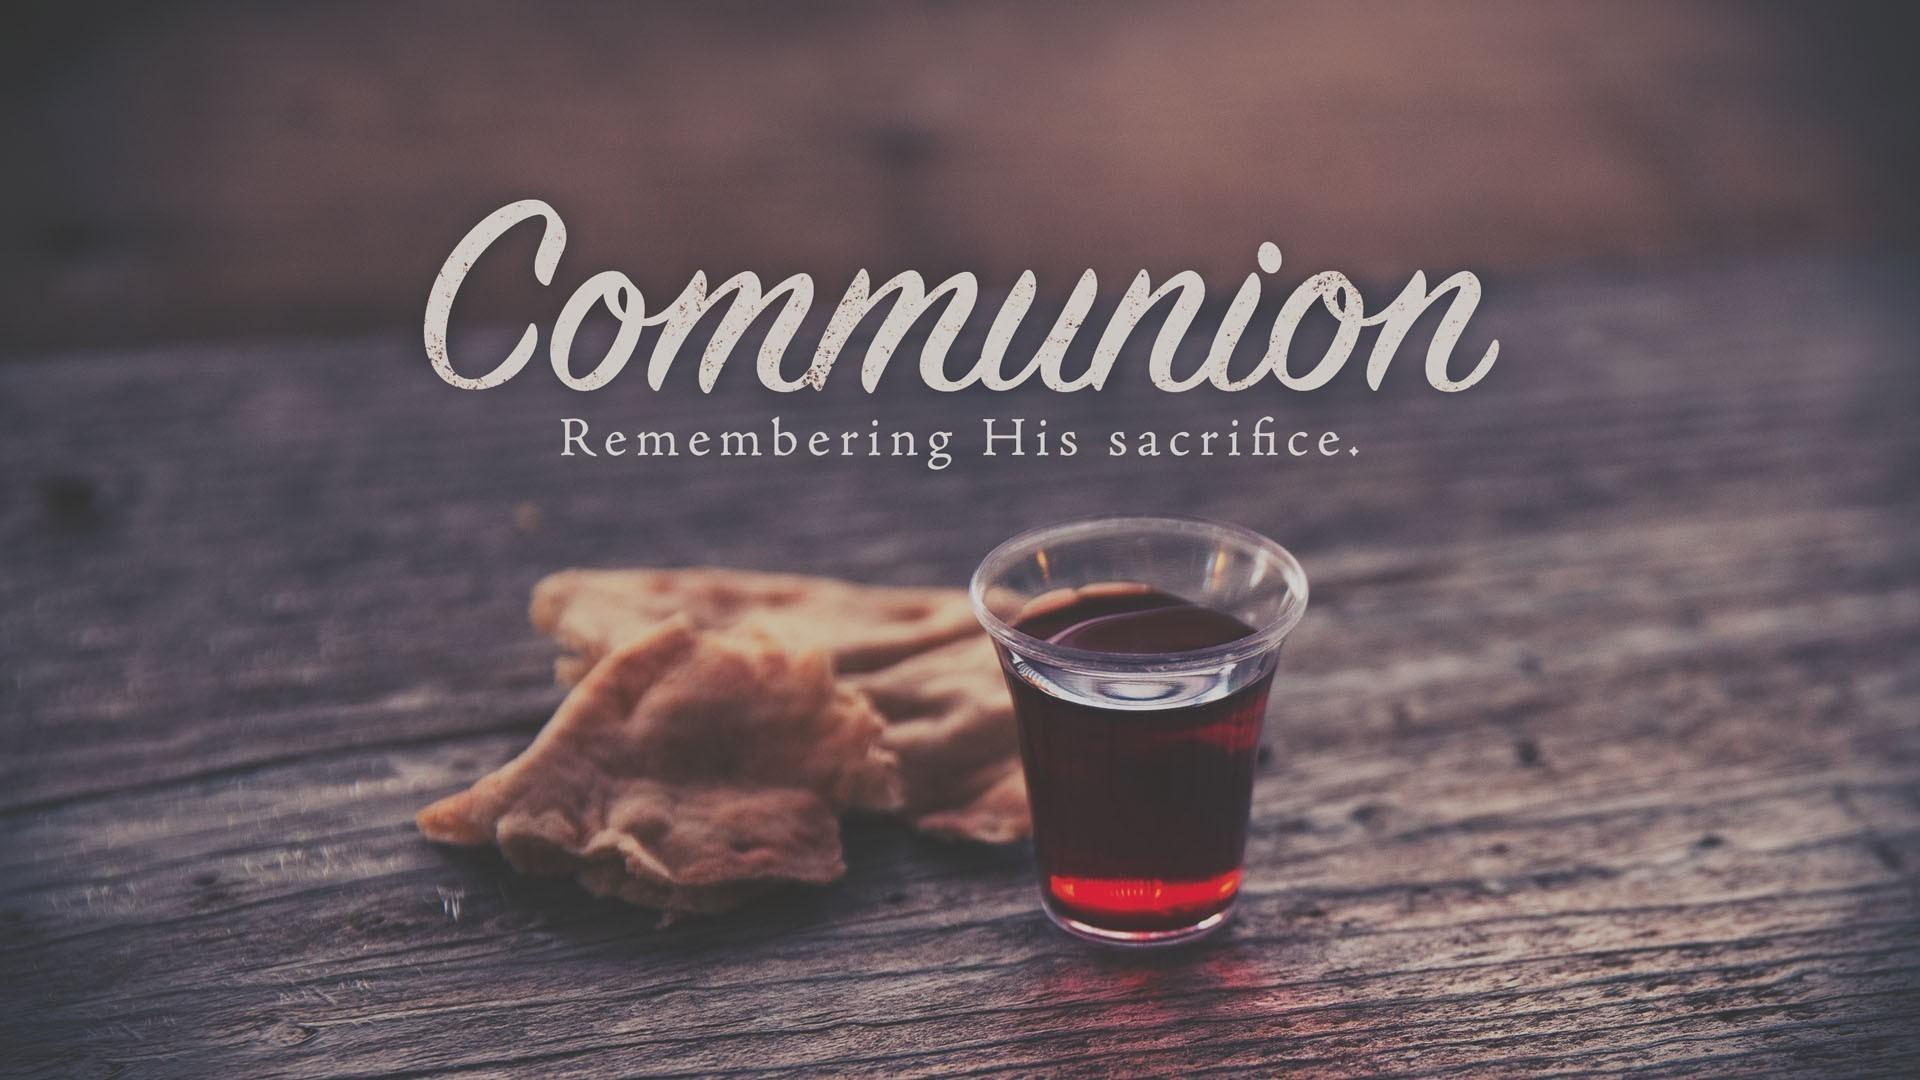 Communion Wallpaper